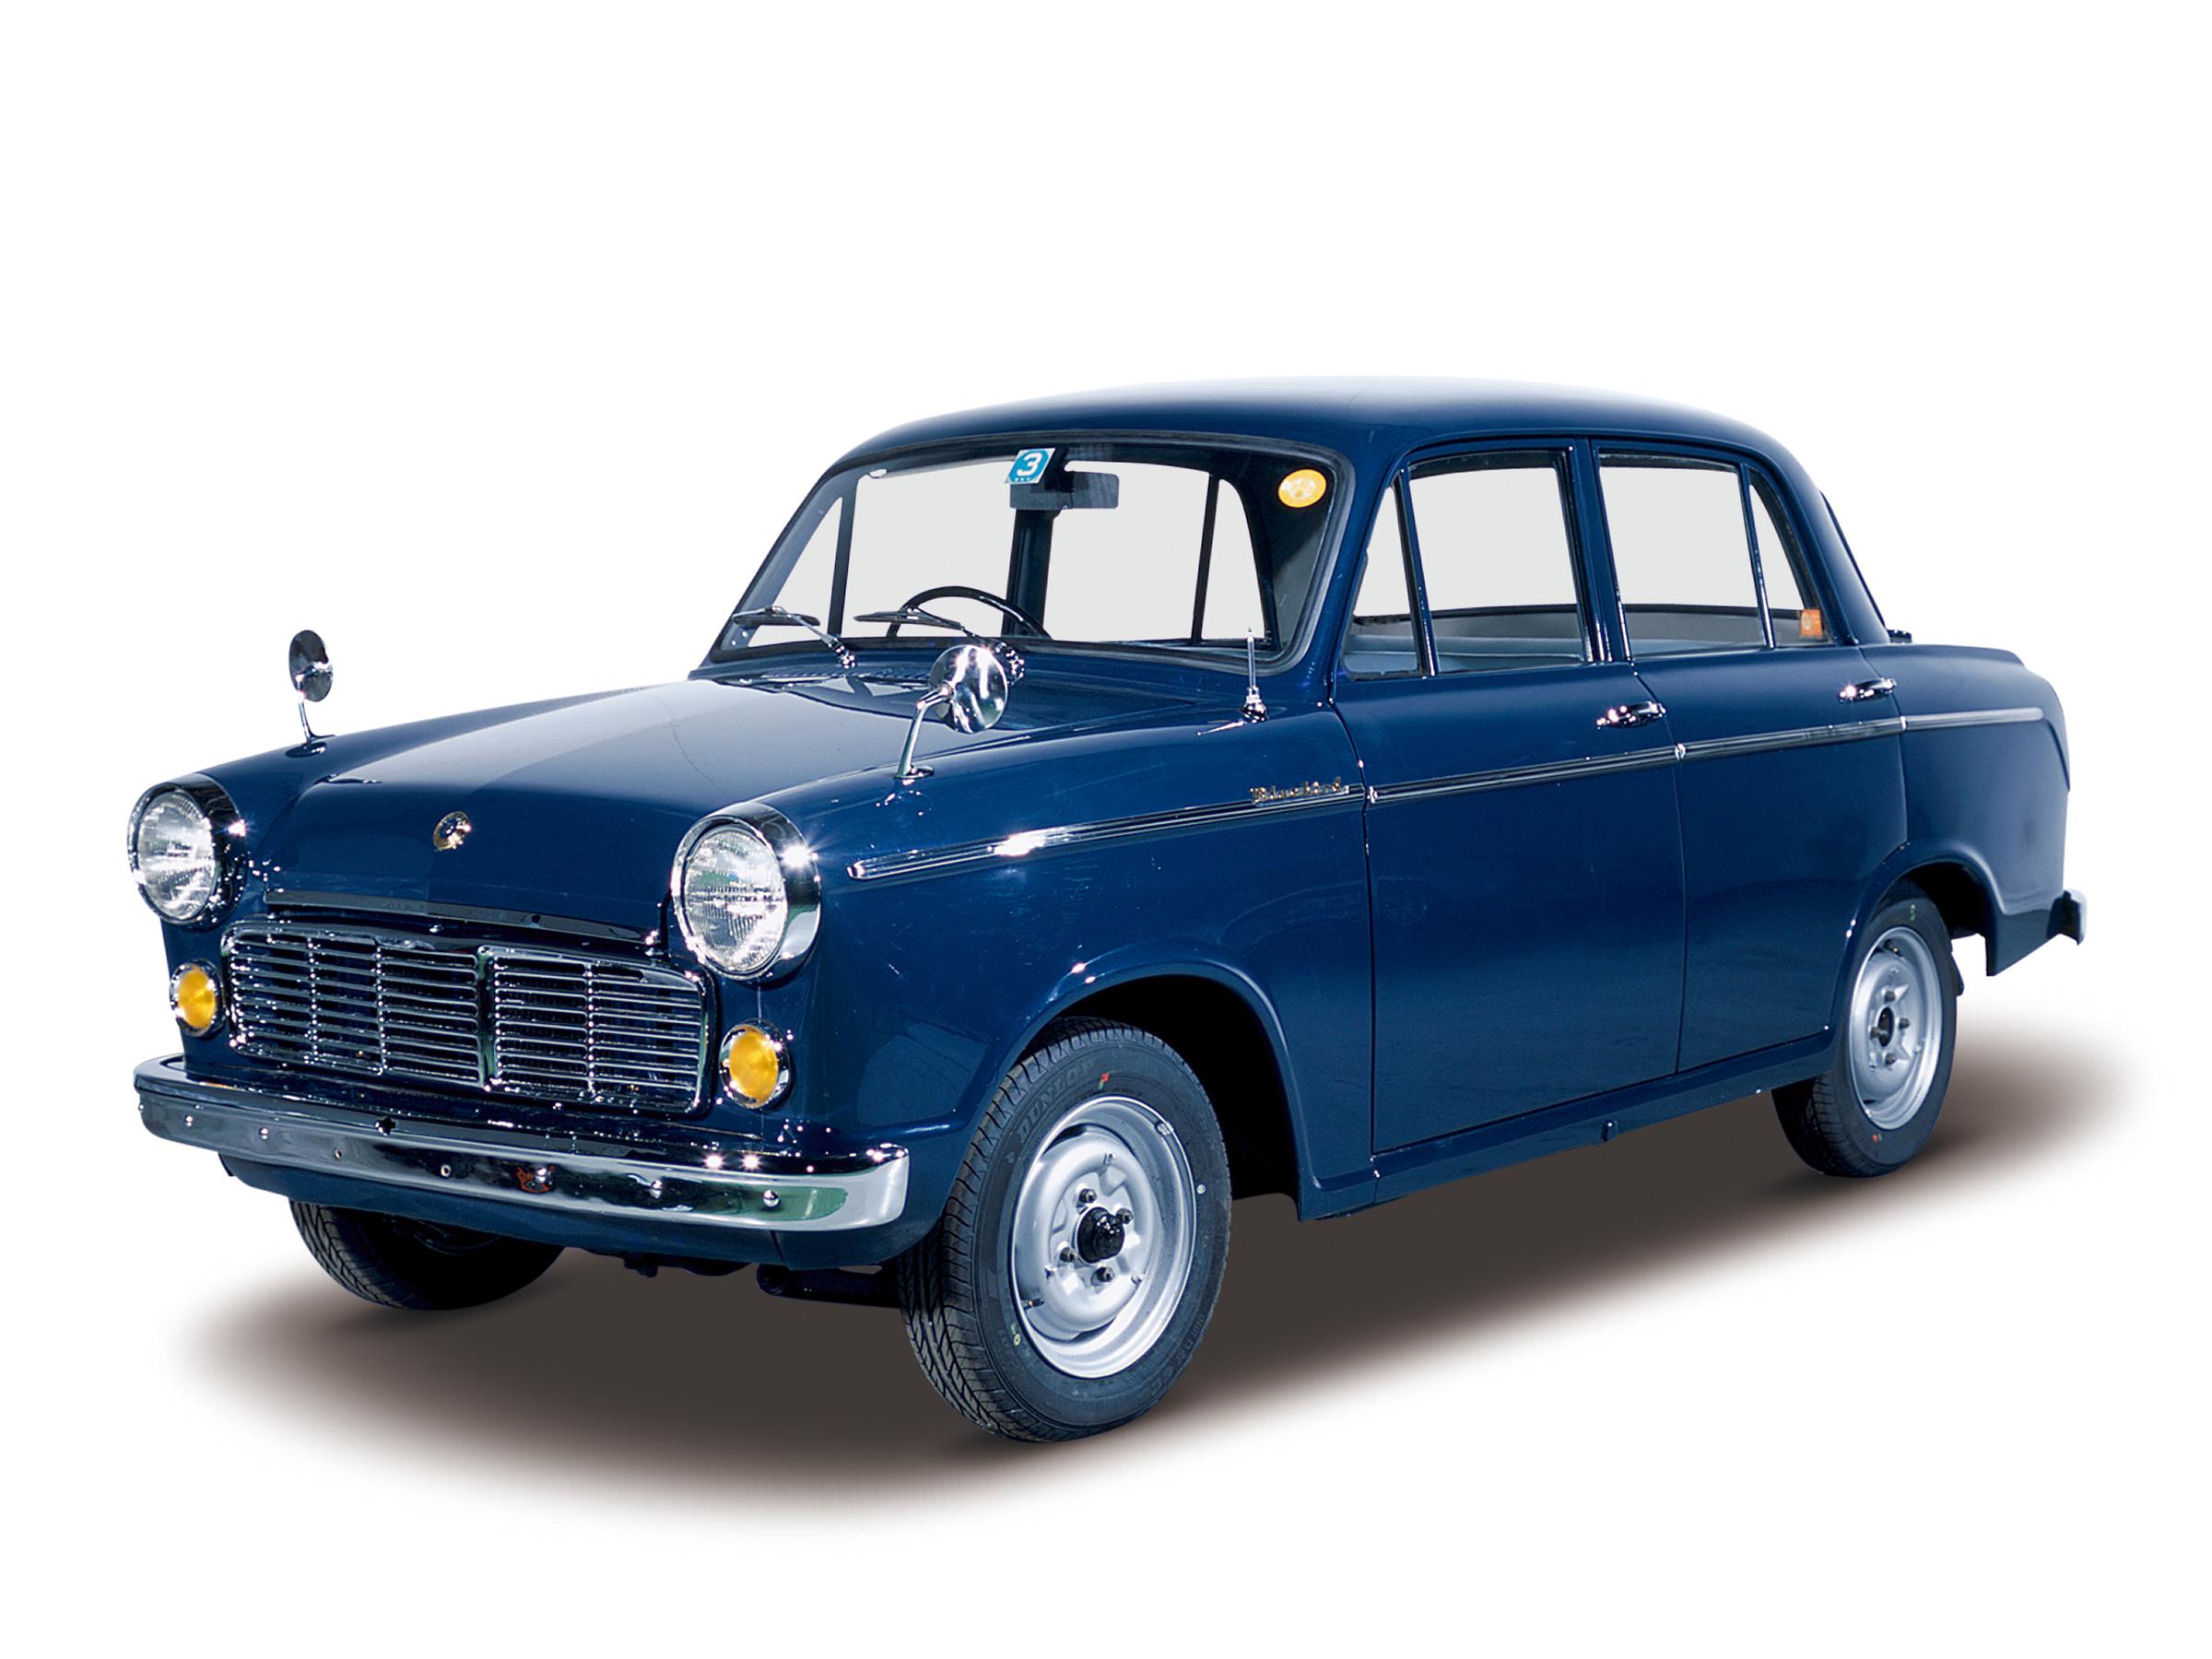 Nissan | Heritage Collection | Datsun Bluebird 1200 Standard